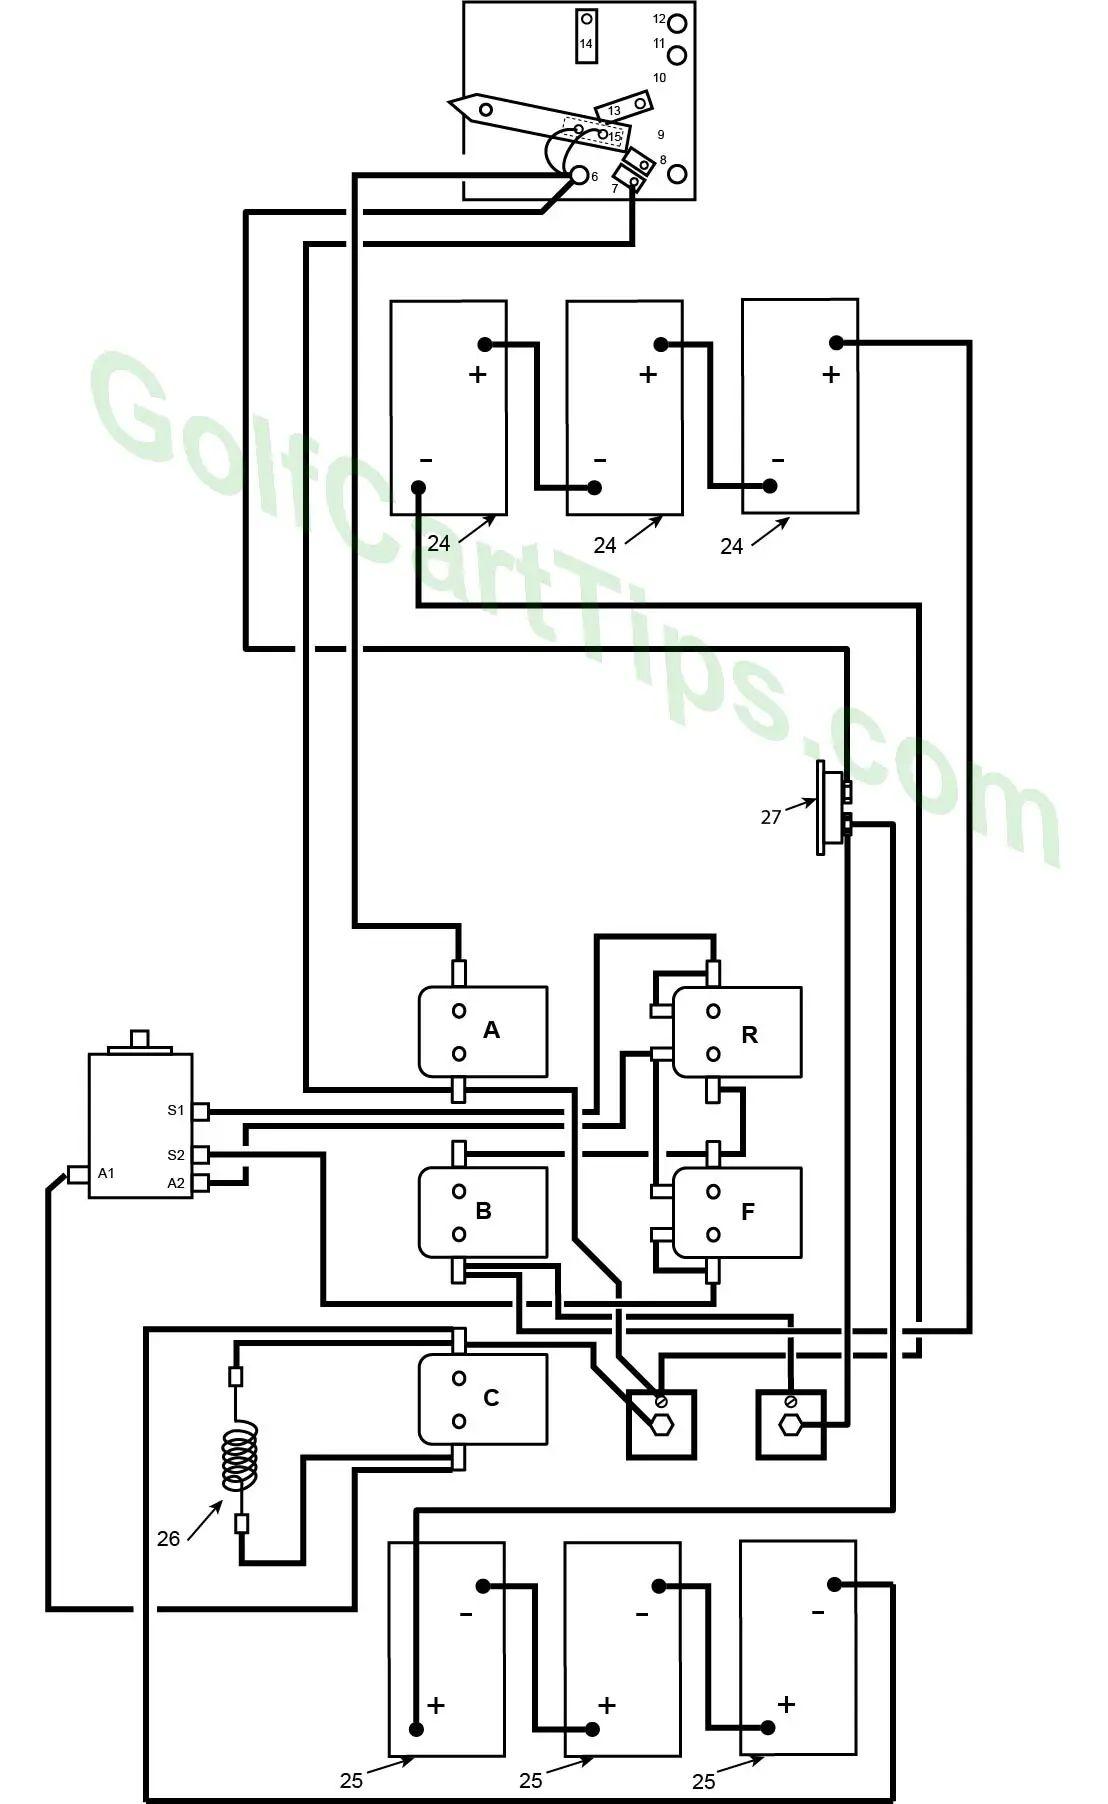 three terminal key switch wiring diagram three circuit diagrams